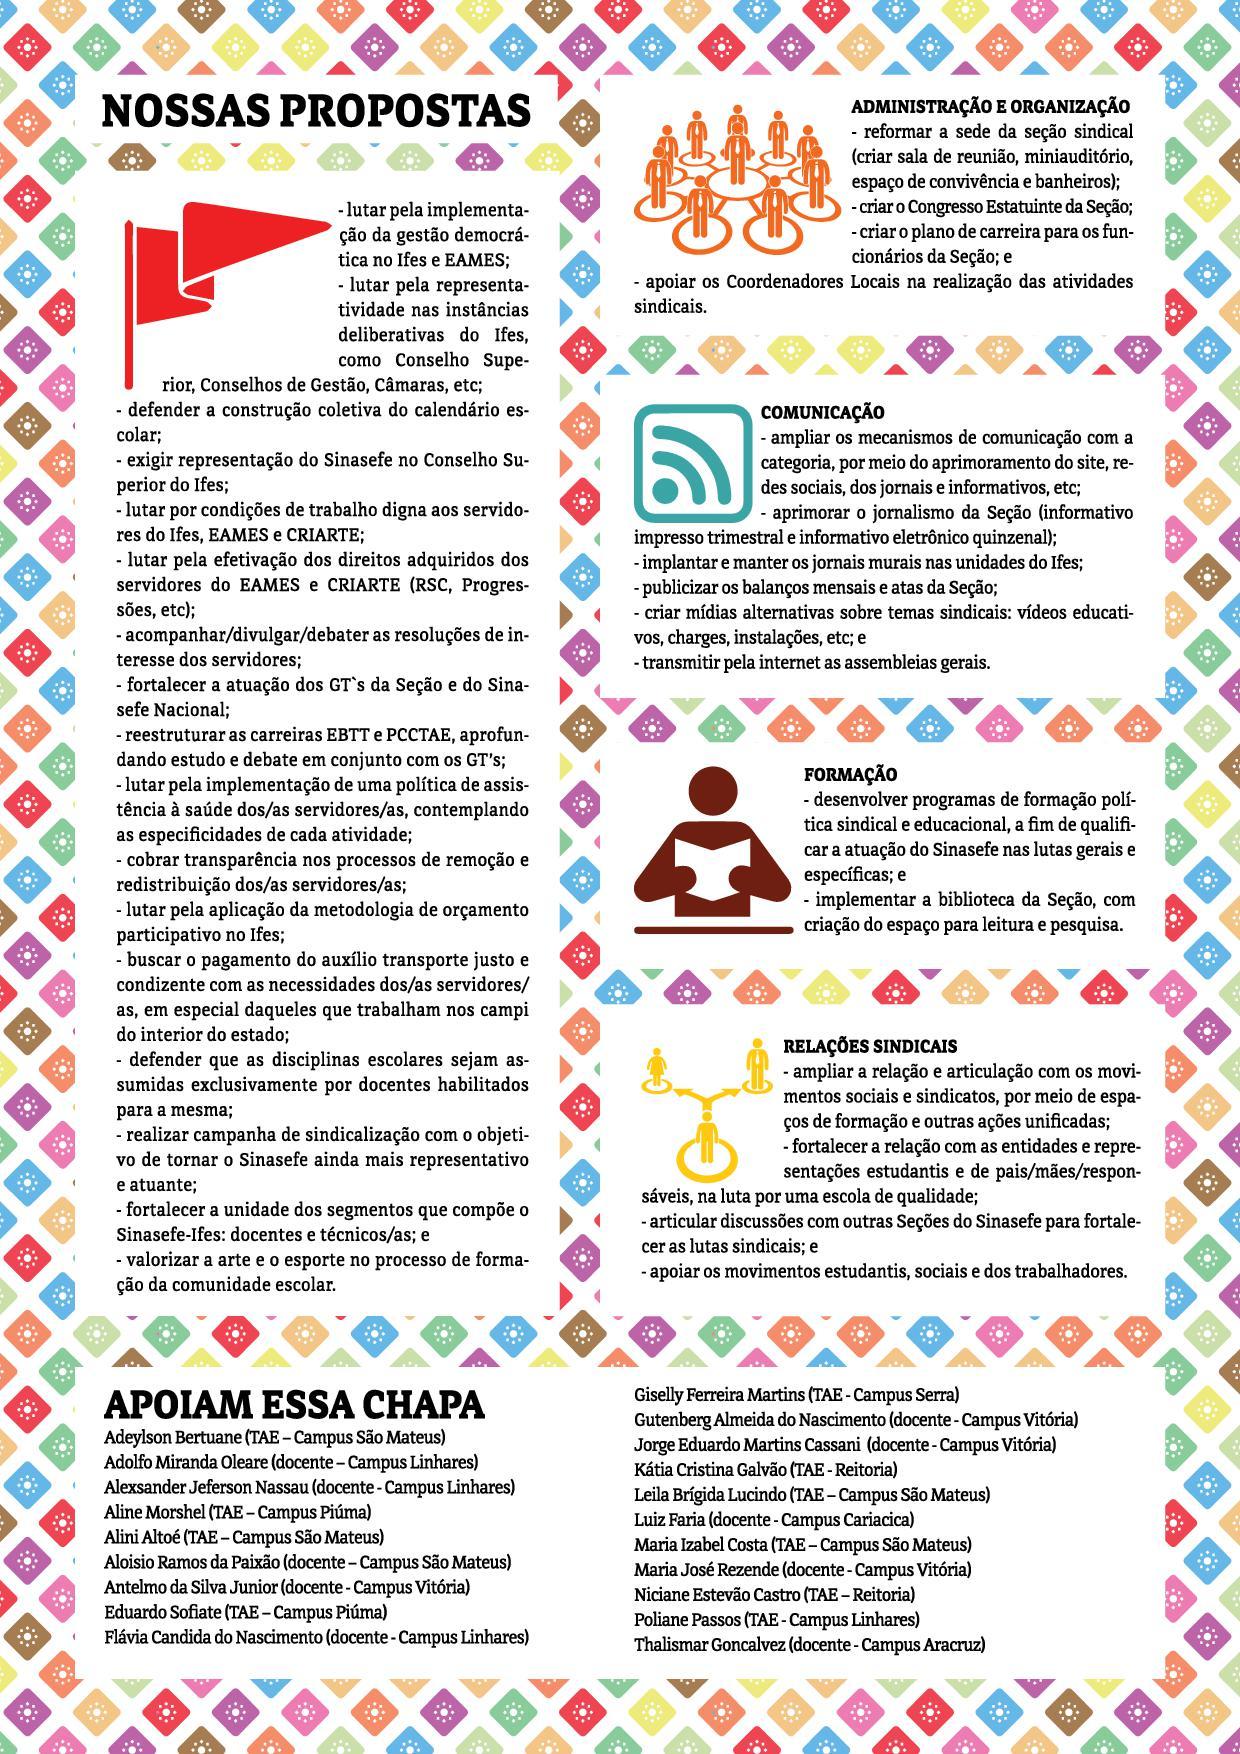 jornal_chapa1_sinasefe_WEB (1)2 (1)